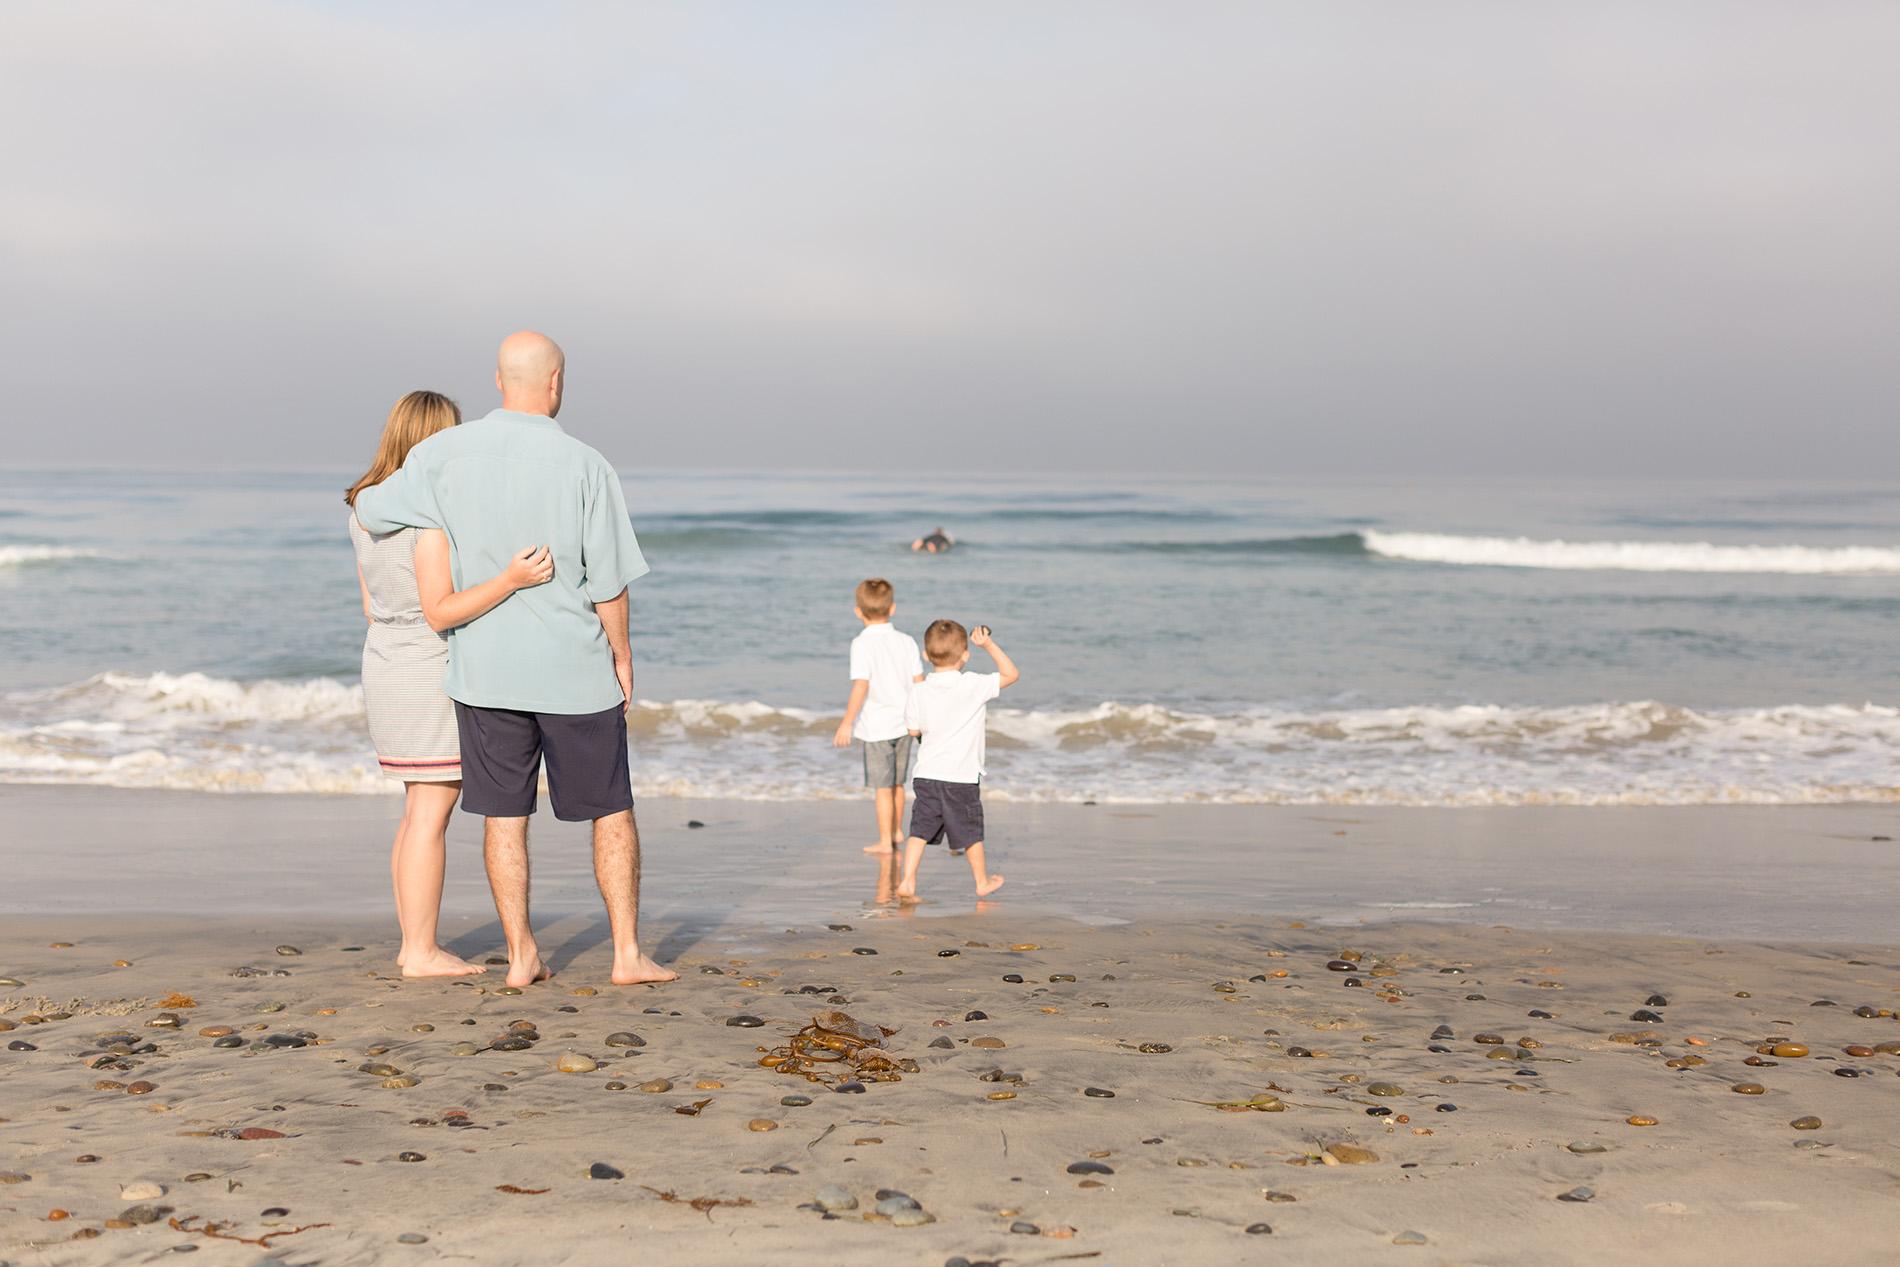 San-Diego-vacation-photographer-christine-dammann-photography-ws.34.jpg